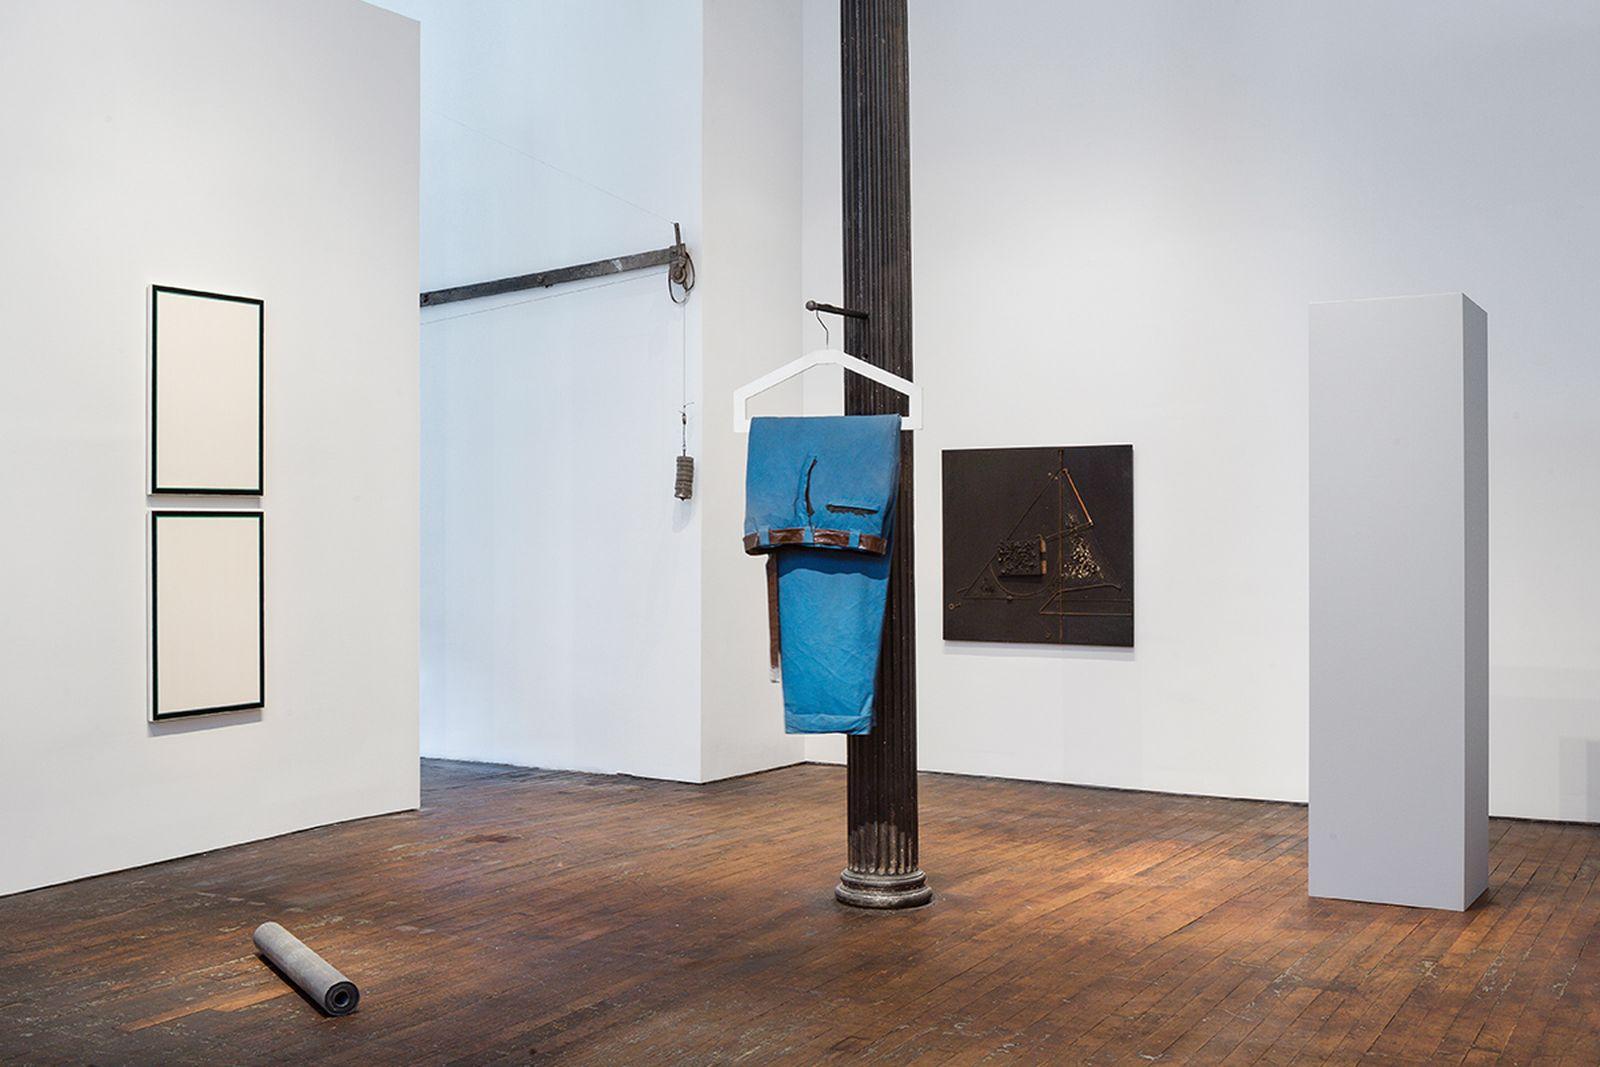 Peter Freeman AMEX american express platinum art & museums